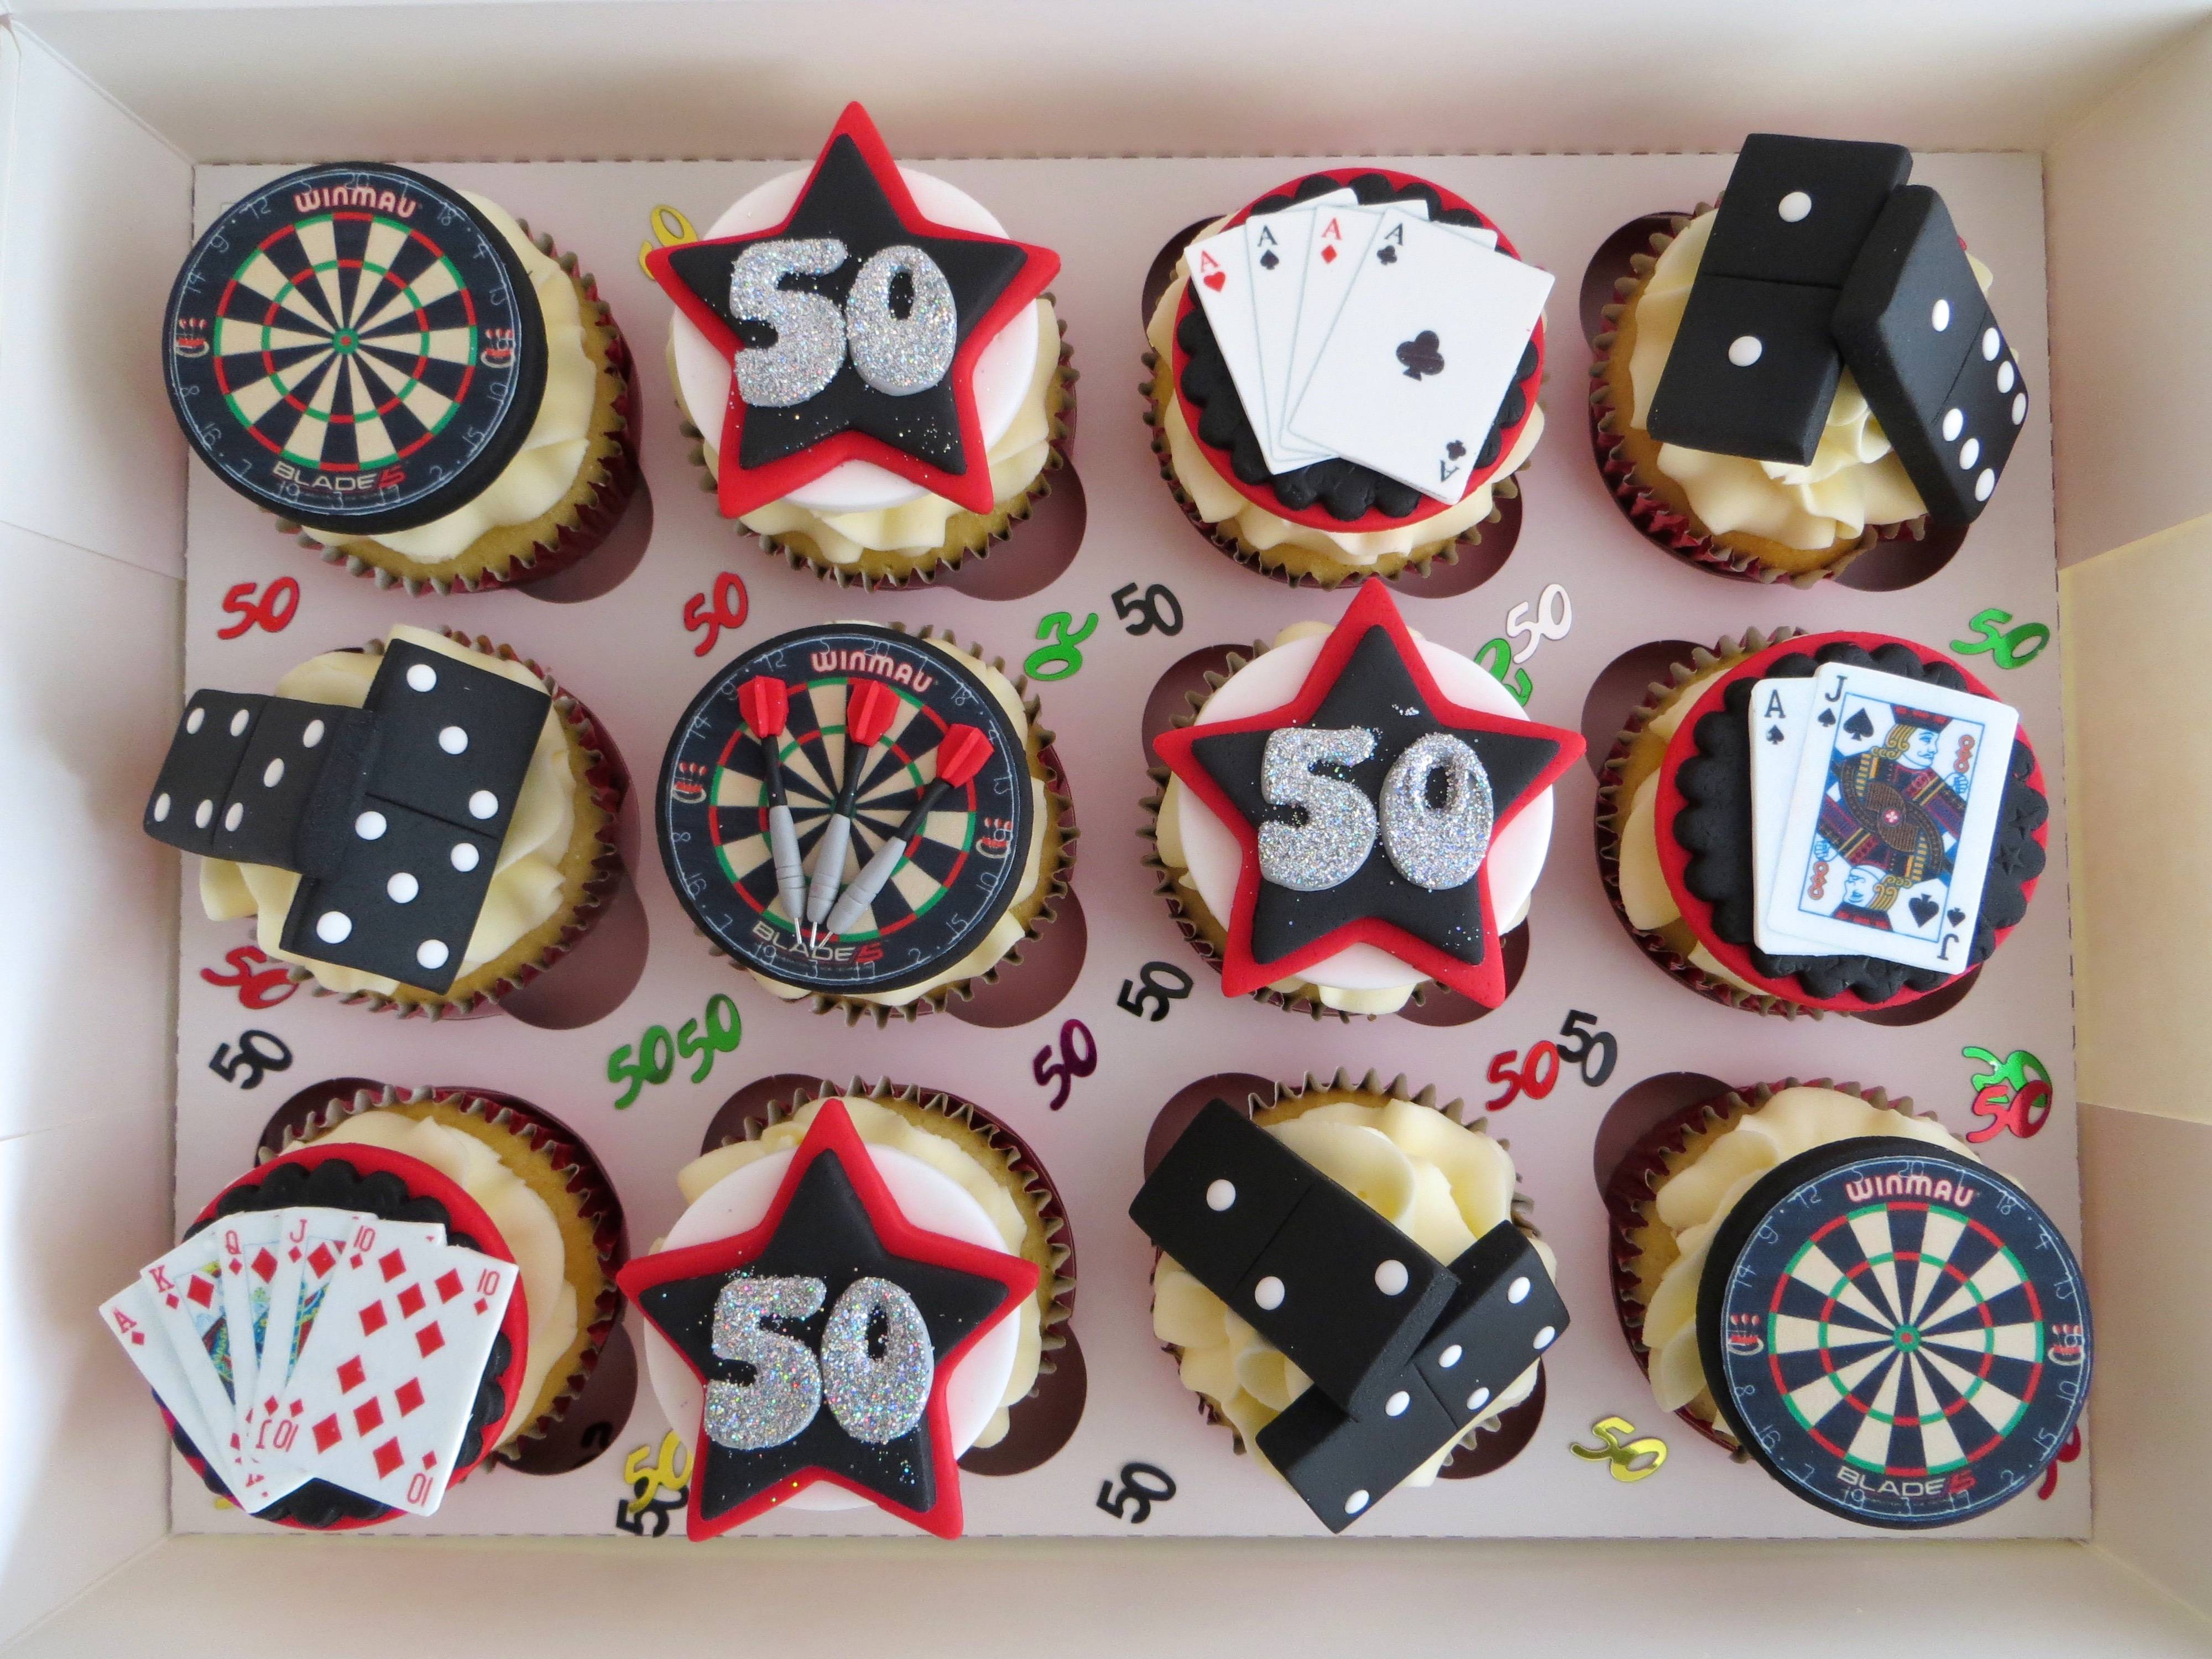 Darts and Dominoes cupcakes